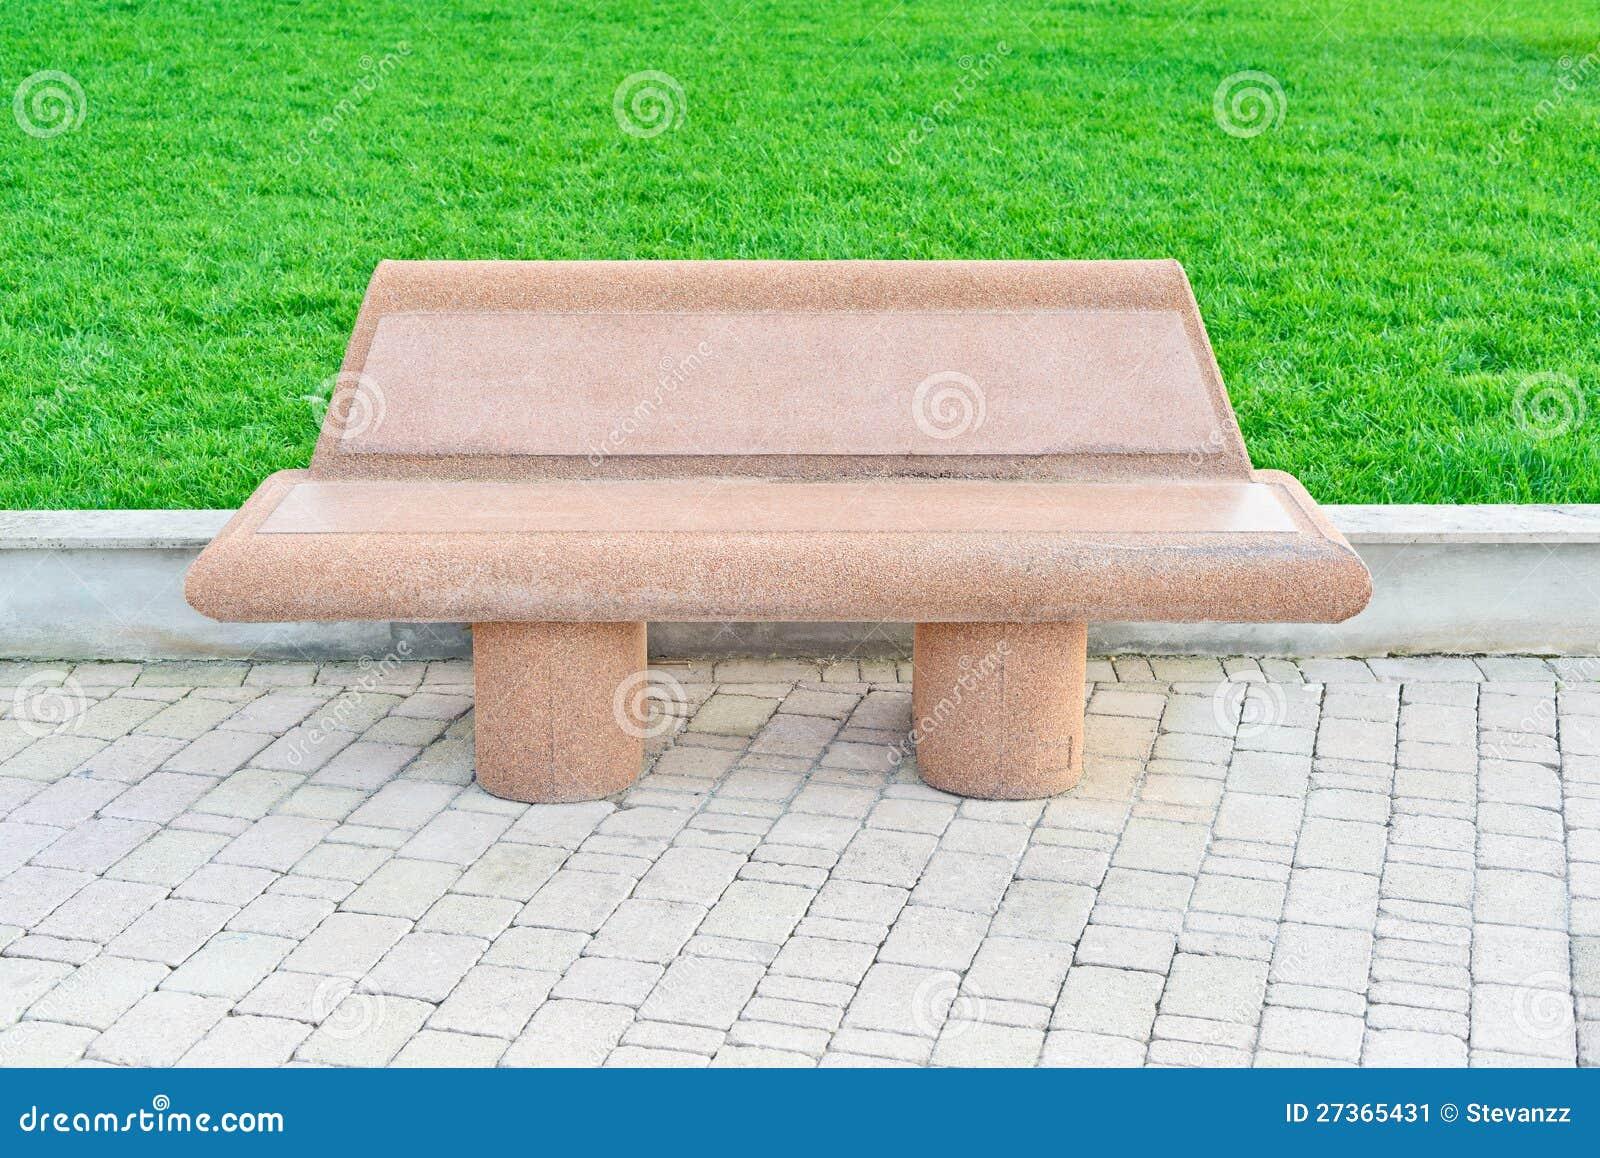 Surprising Stone Bench In A Public Garden Park Stock Image Image Of Uwap Interior Chair Design Uwaporg